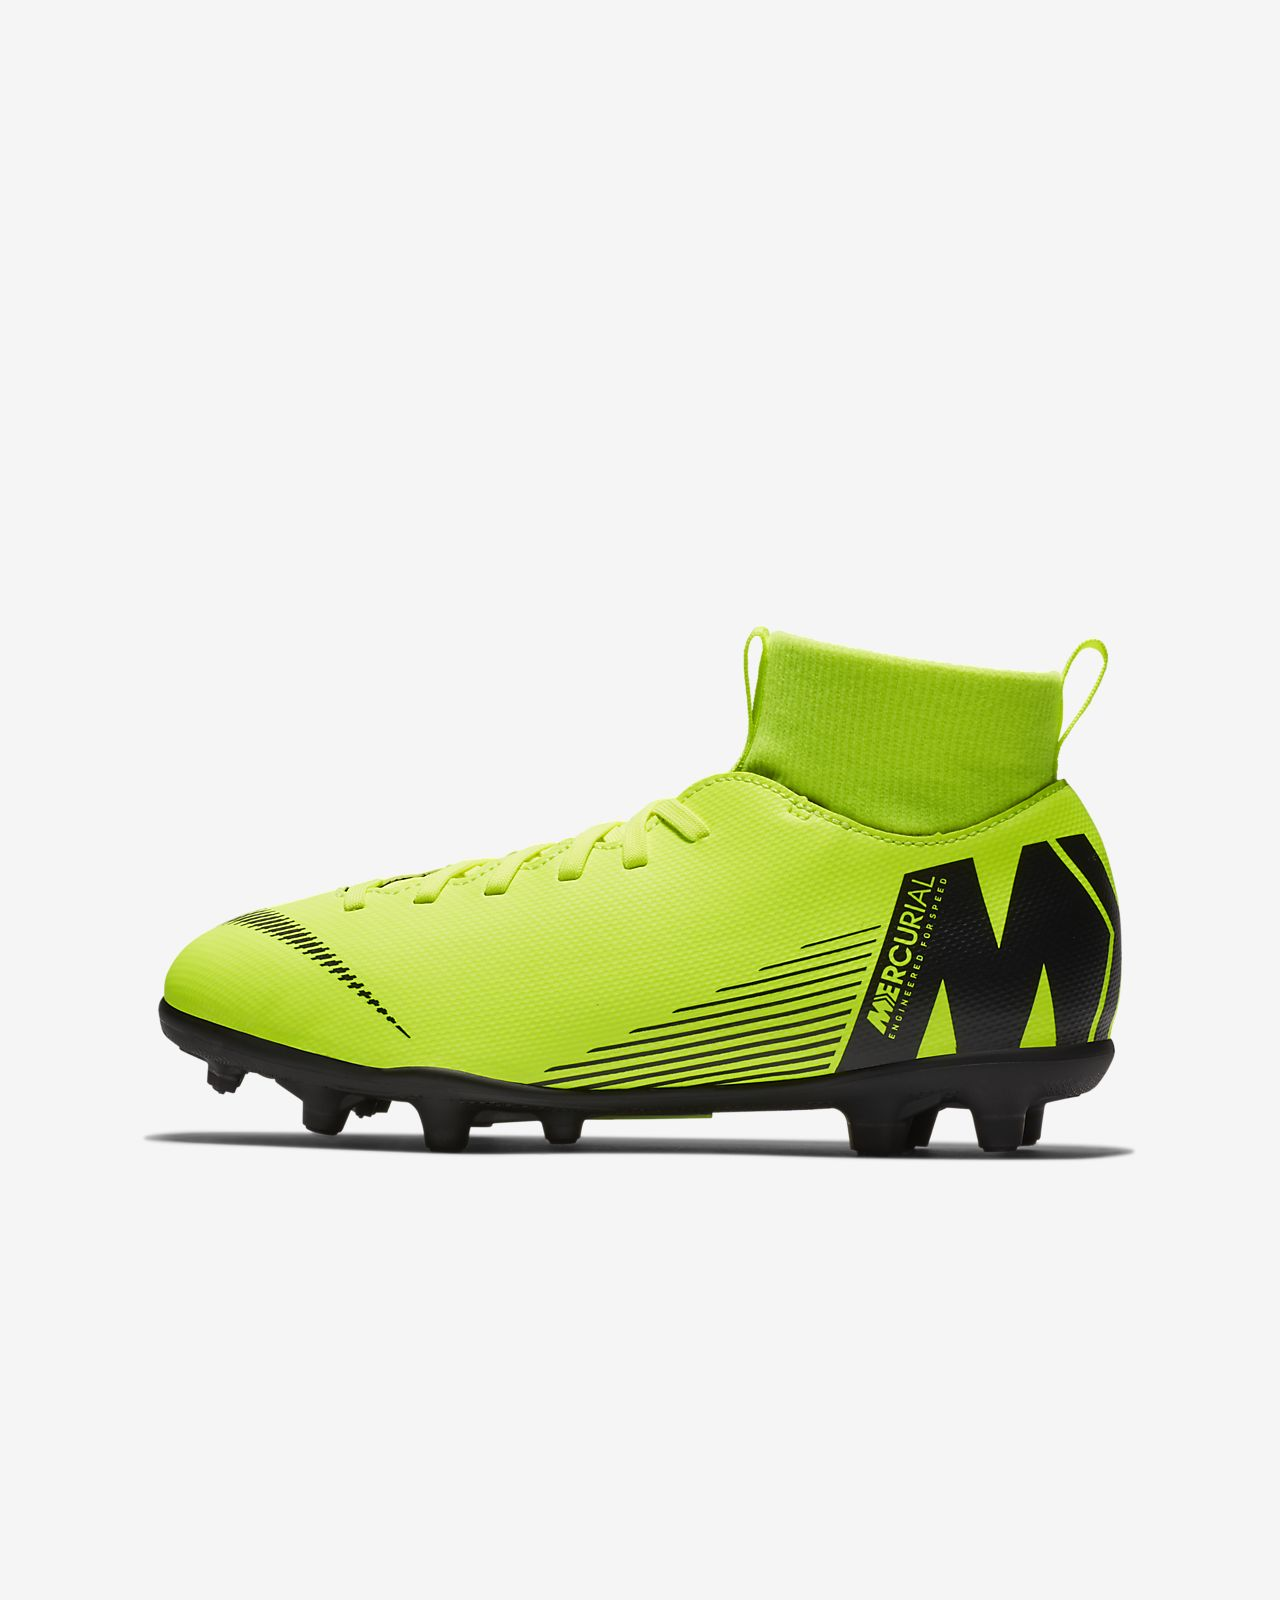 18b1f4e3f87e8 ... Calzado de fútbol para múltiples superficies para niños talla  pequeña grande Nike Jr. Mercurial